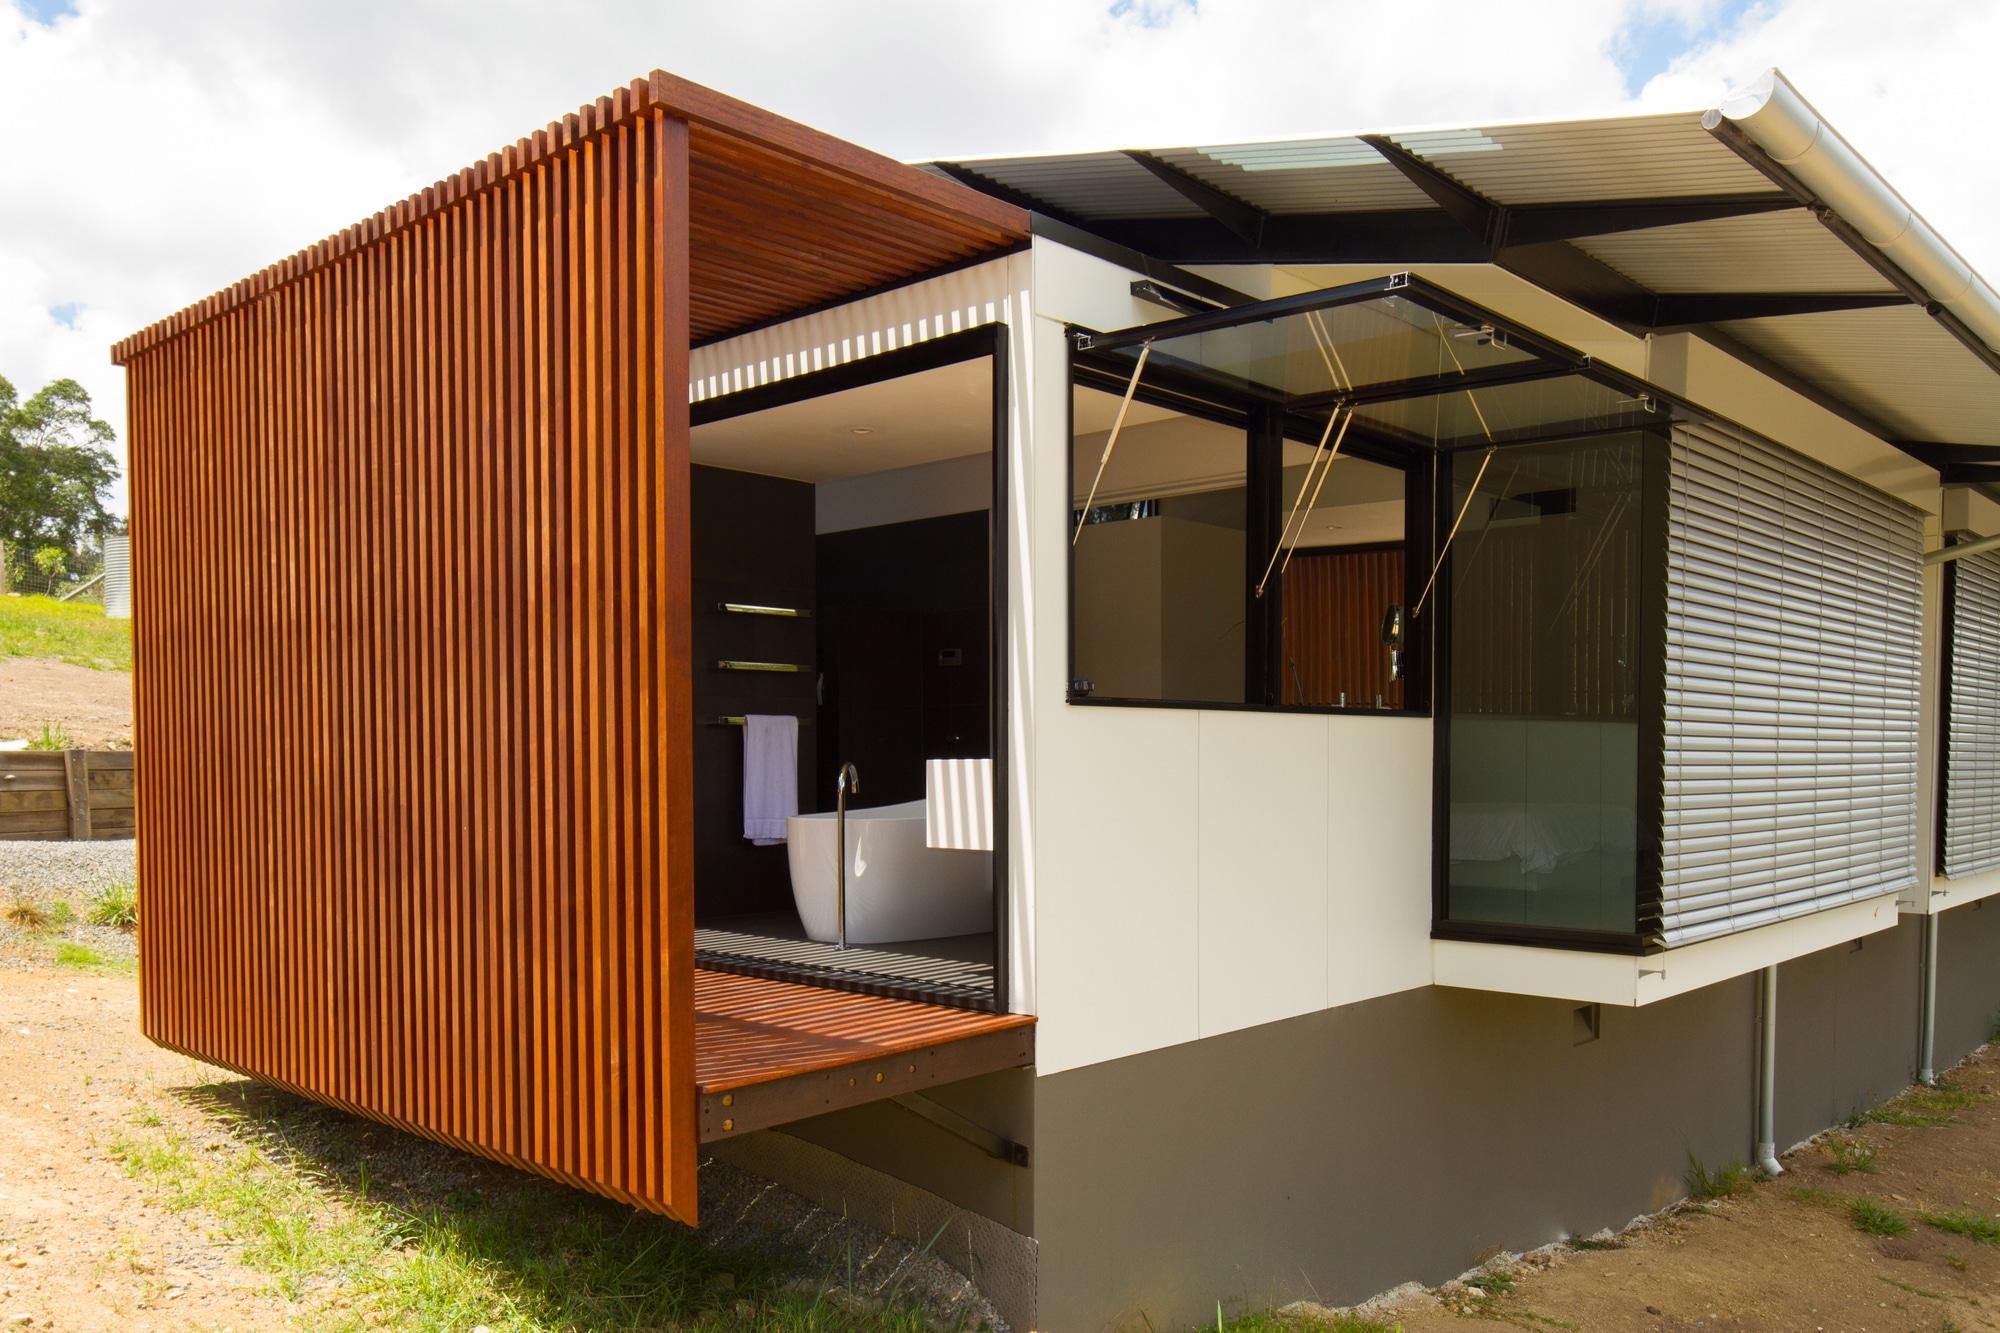 Dise o de casa moderna en terreno largo y angosto for Imagenes de techos de casas modernas